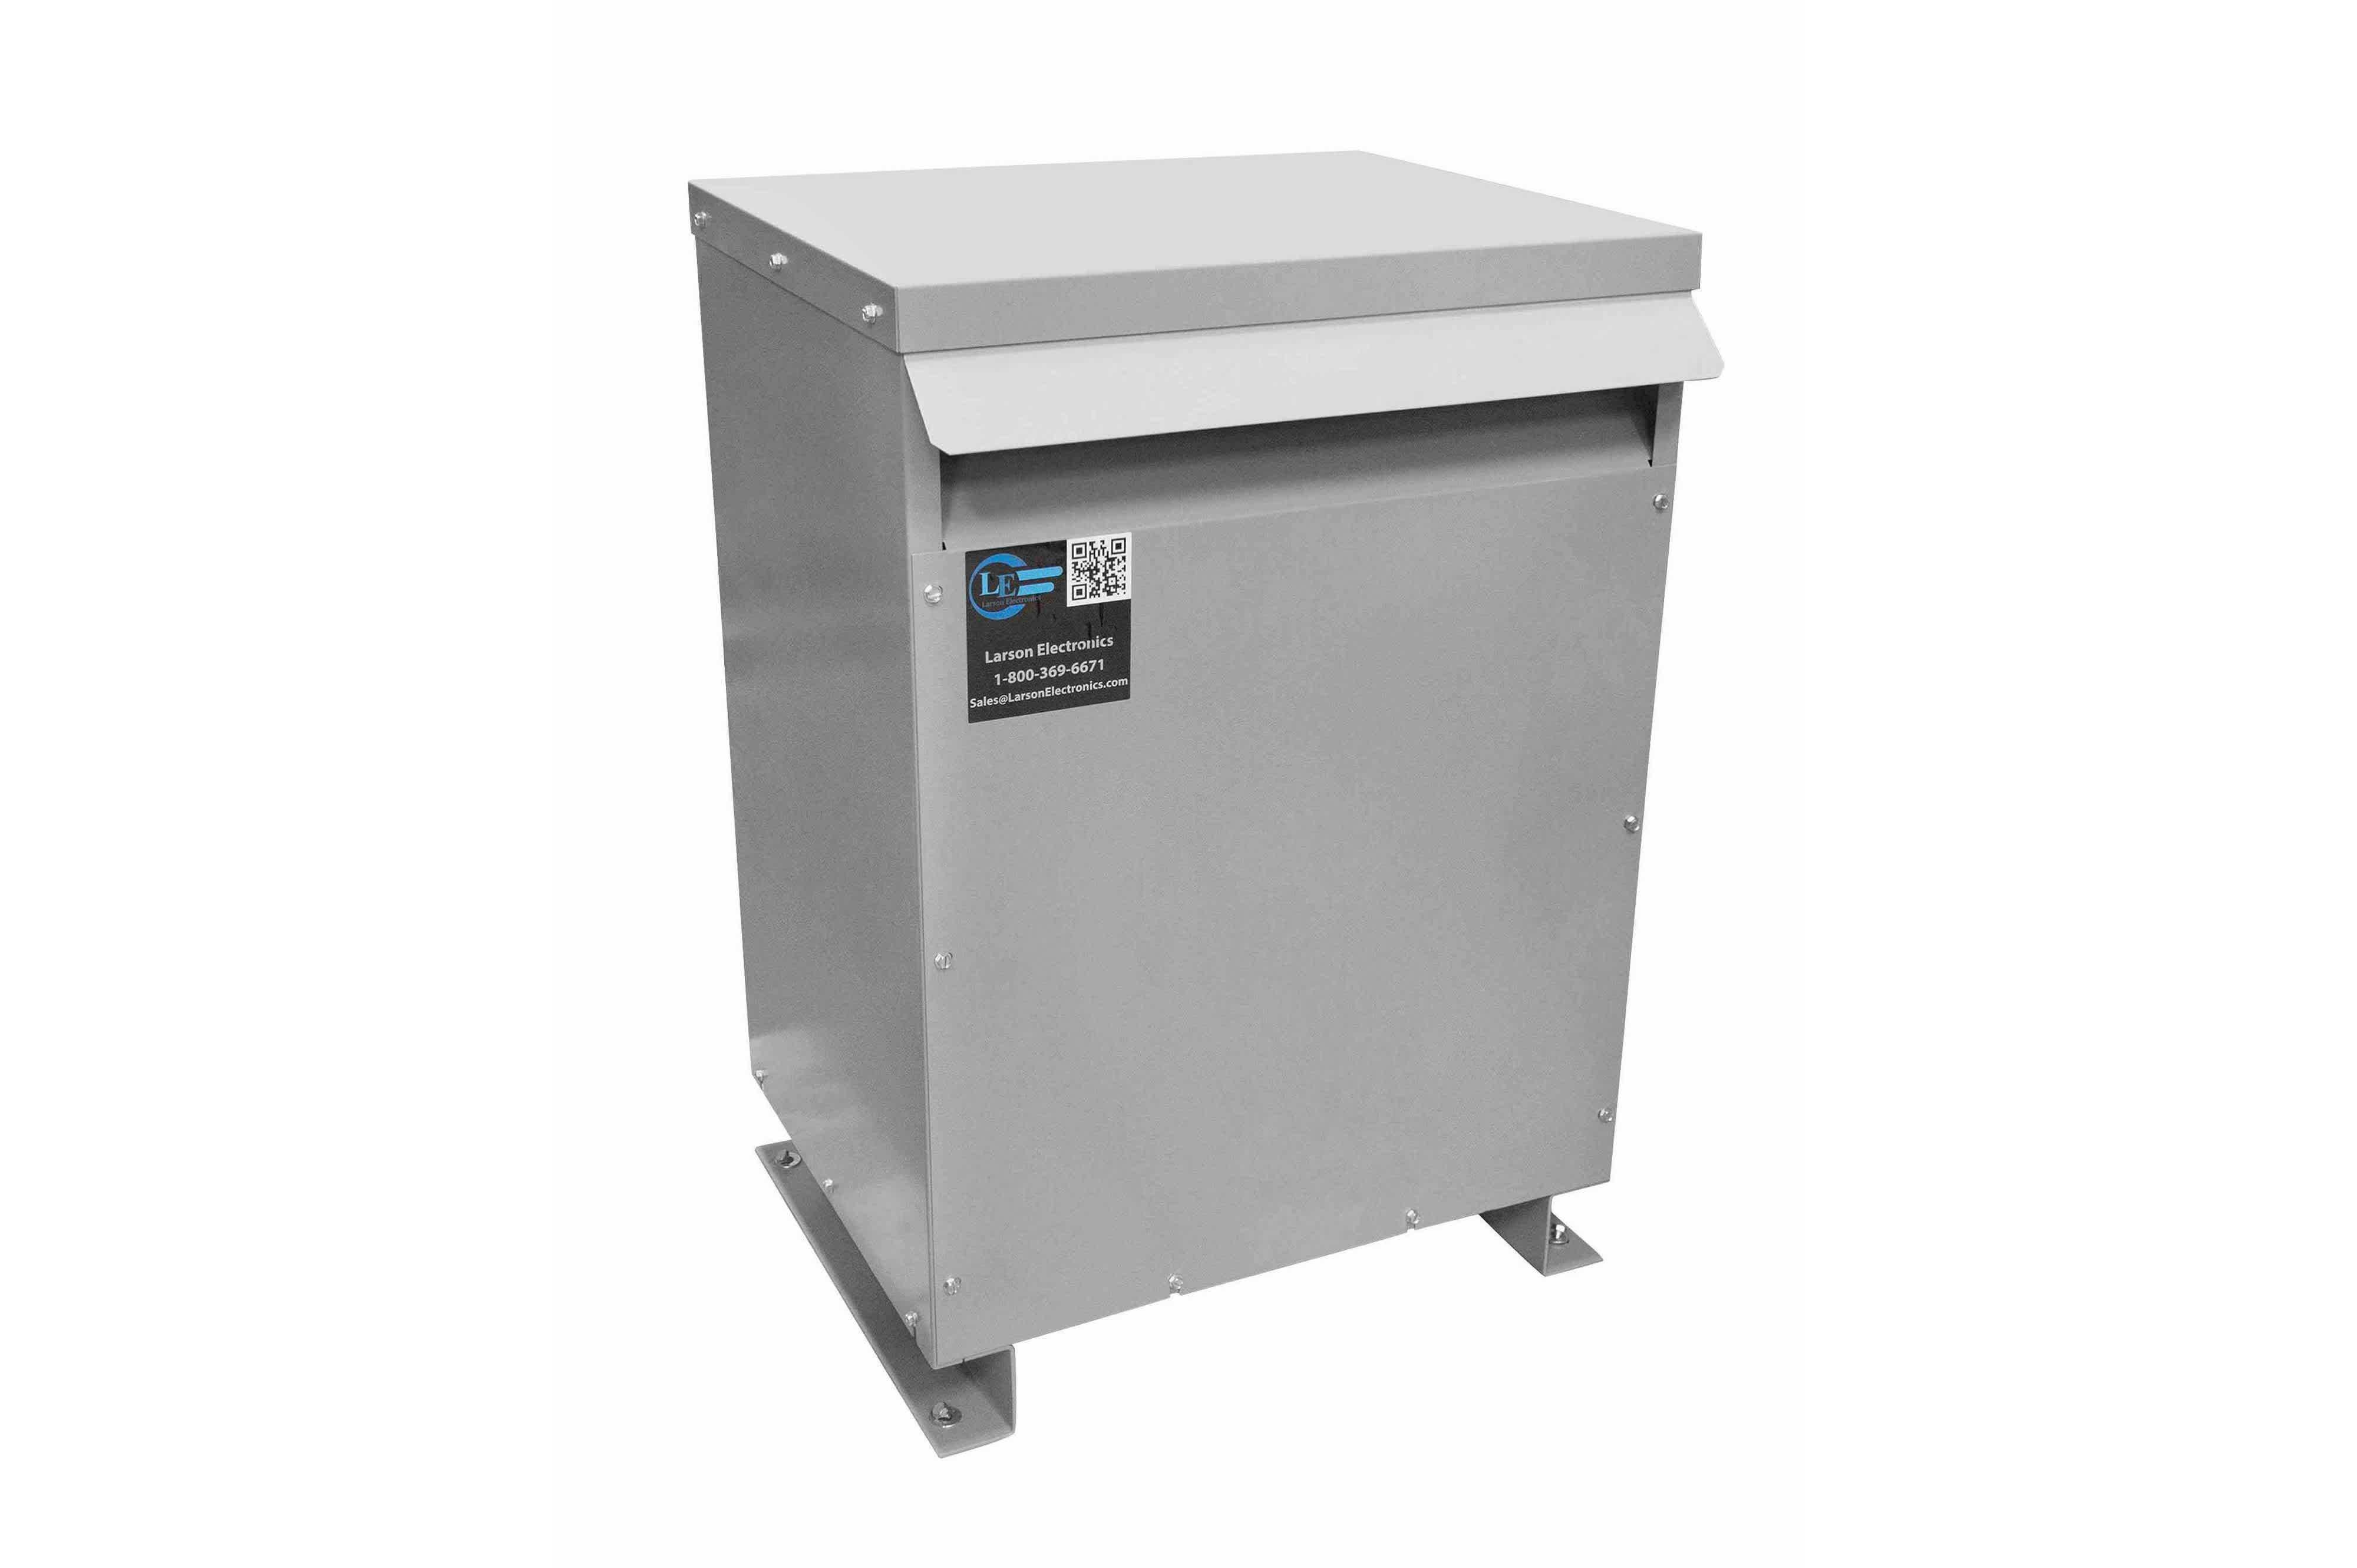 80 kVA 3PH DOE Transformer, 208V Delta Primary, 480Y/277 Wye-N Secondary, N3R, Ventilated, 60 Hz